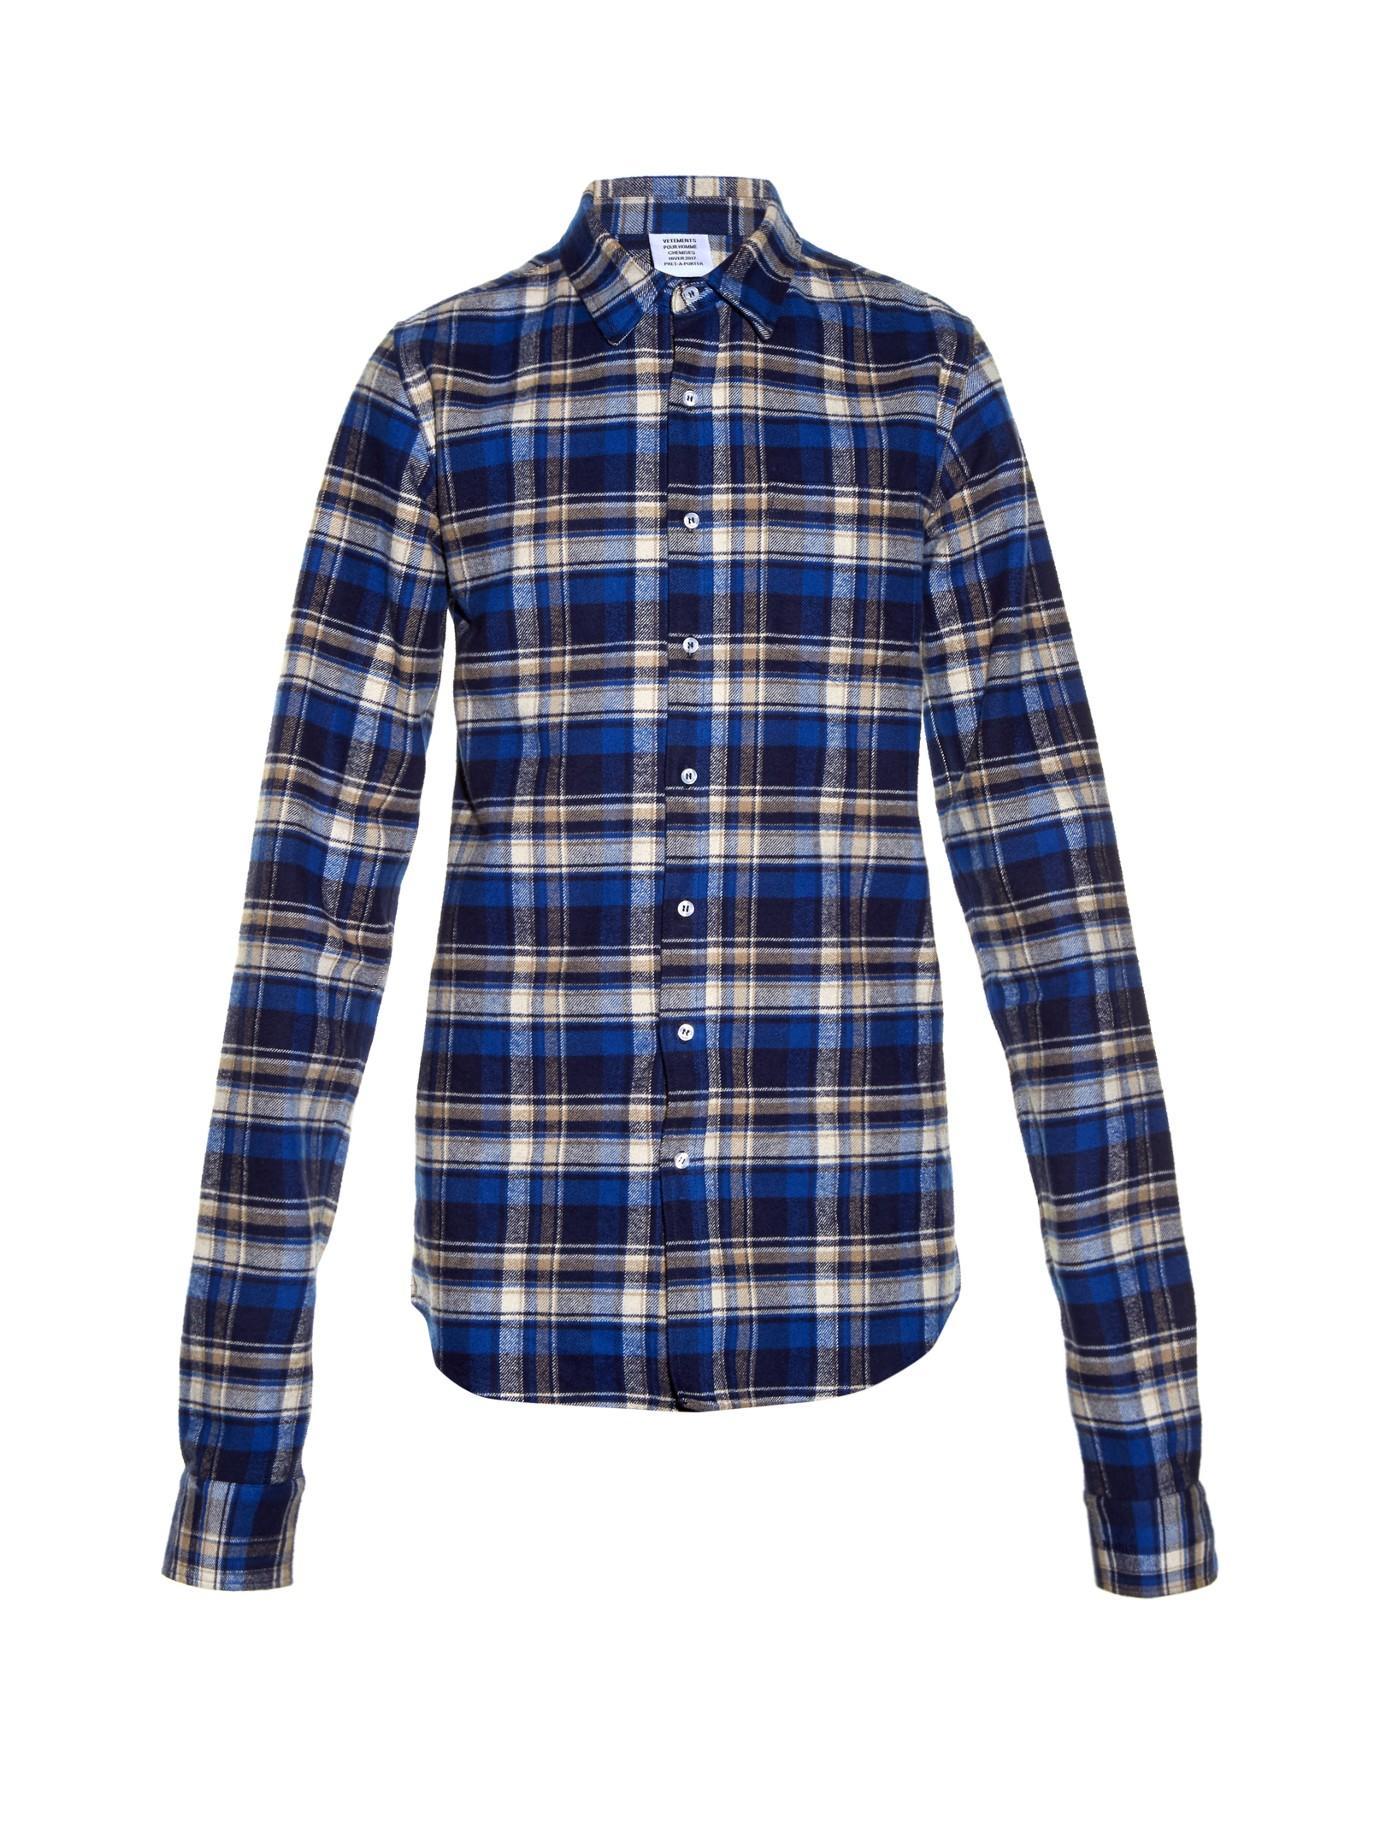 Vetements Plaid Flannel Shirt In Blue For Men Lyst